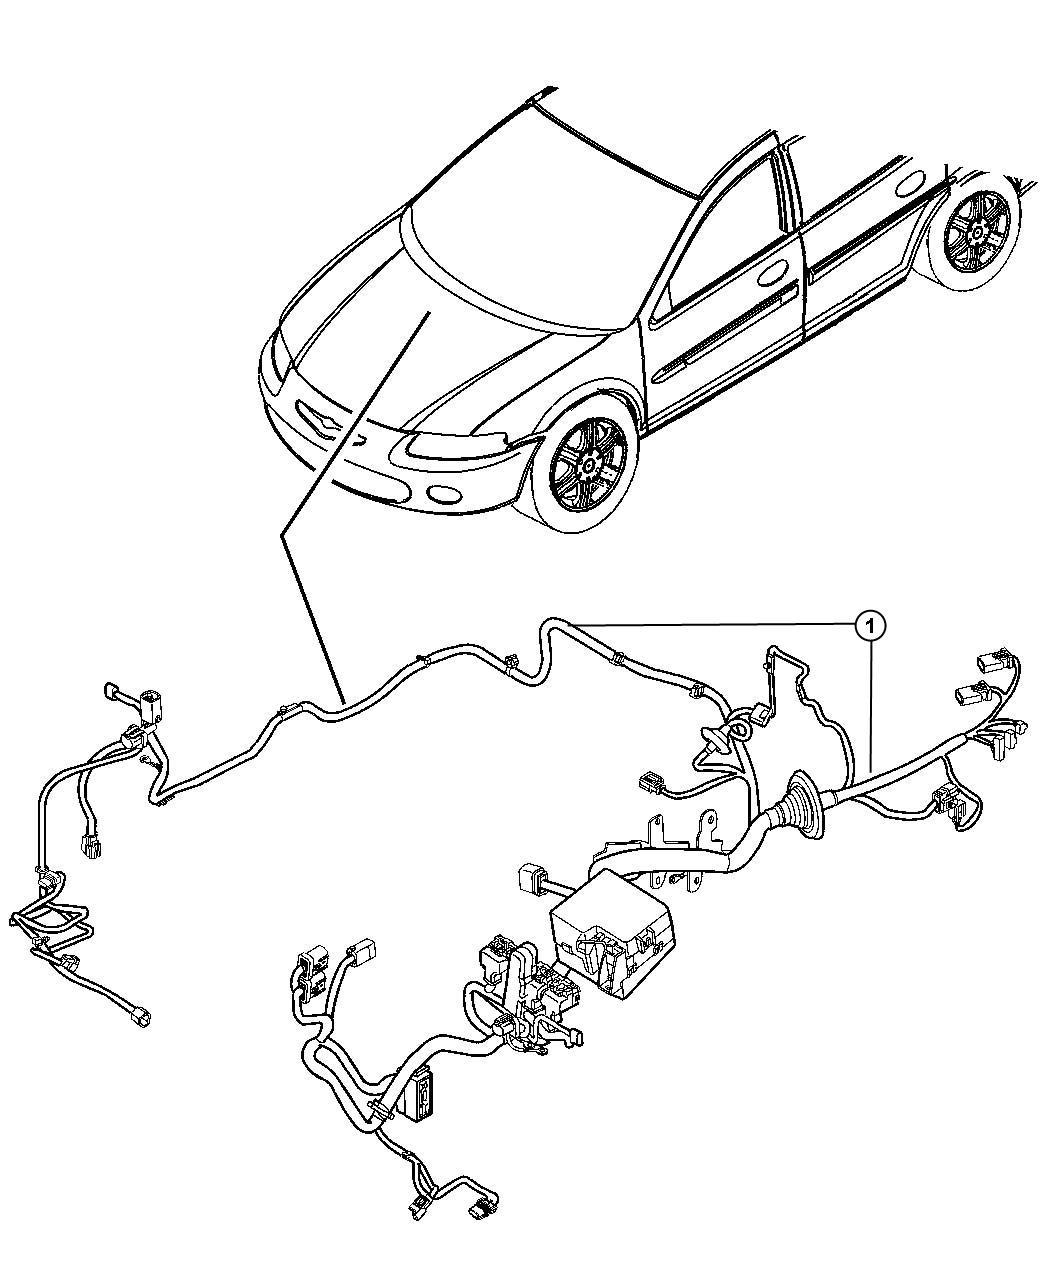 Dodge Express Wiring. Headlamp to dash. Mopar, electrical